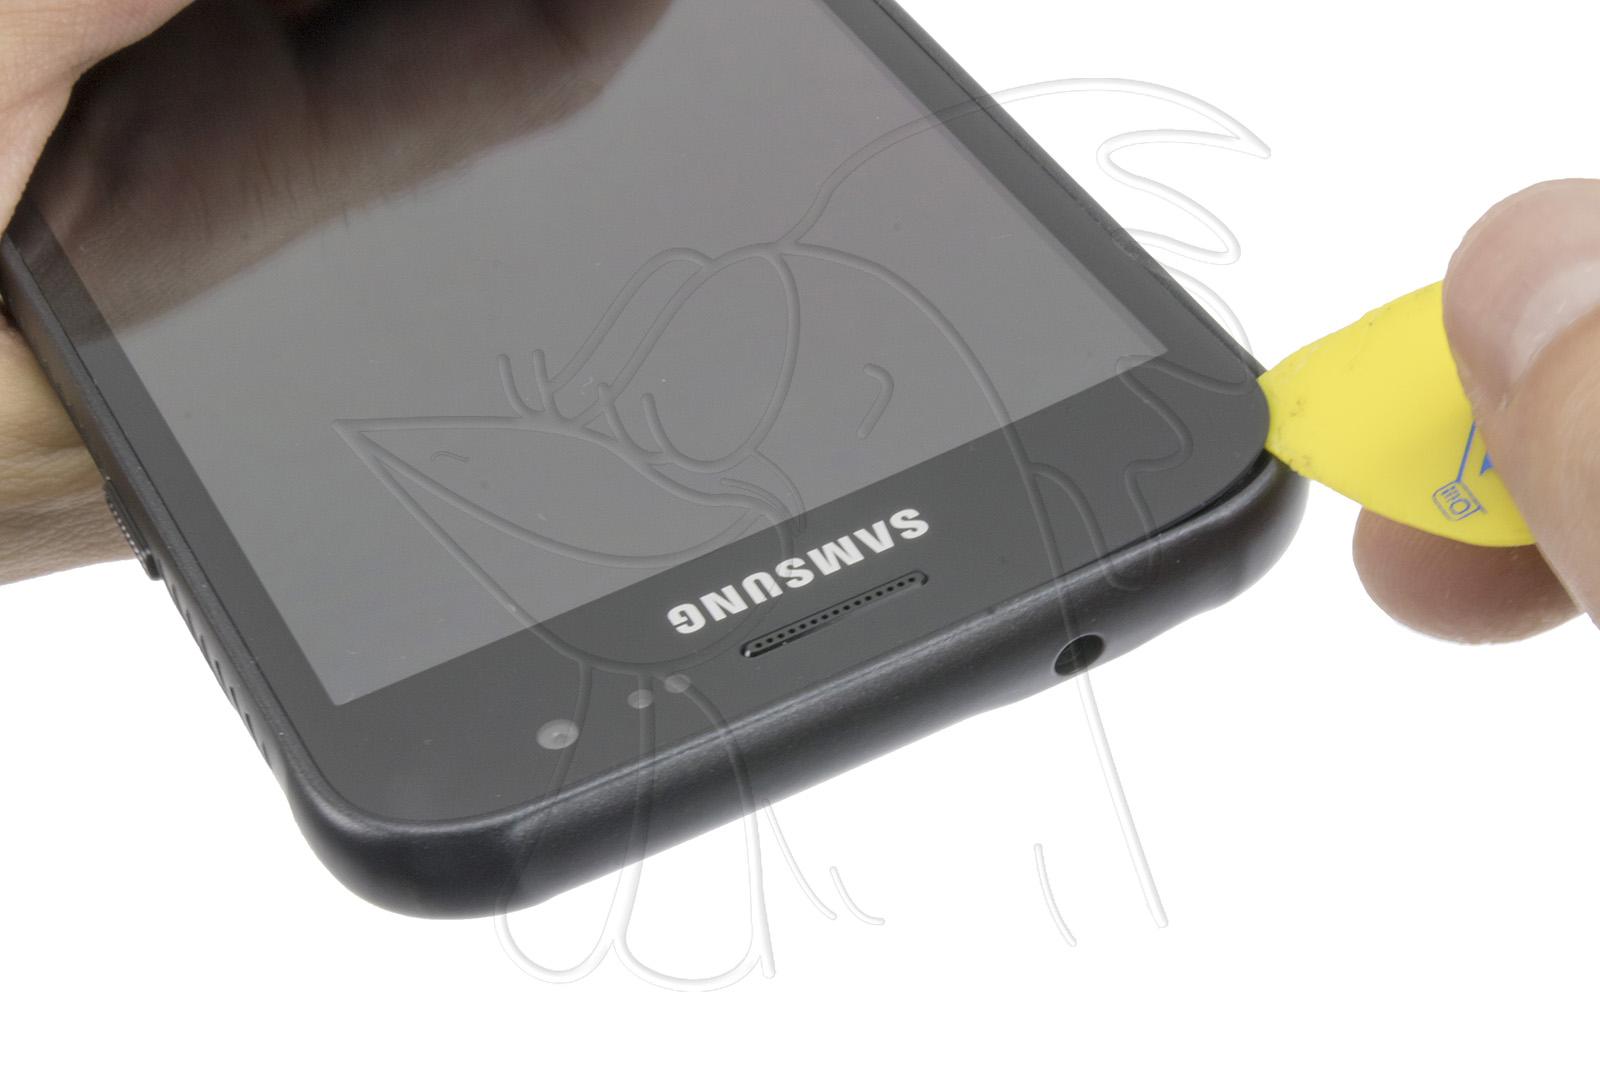 Samsung Xcover Manual Remtron Pump Boss Wire Diagram Array Galaxy 2 Rh Apnmata